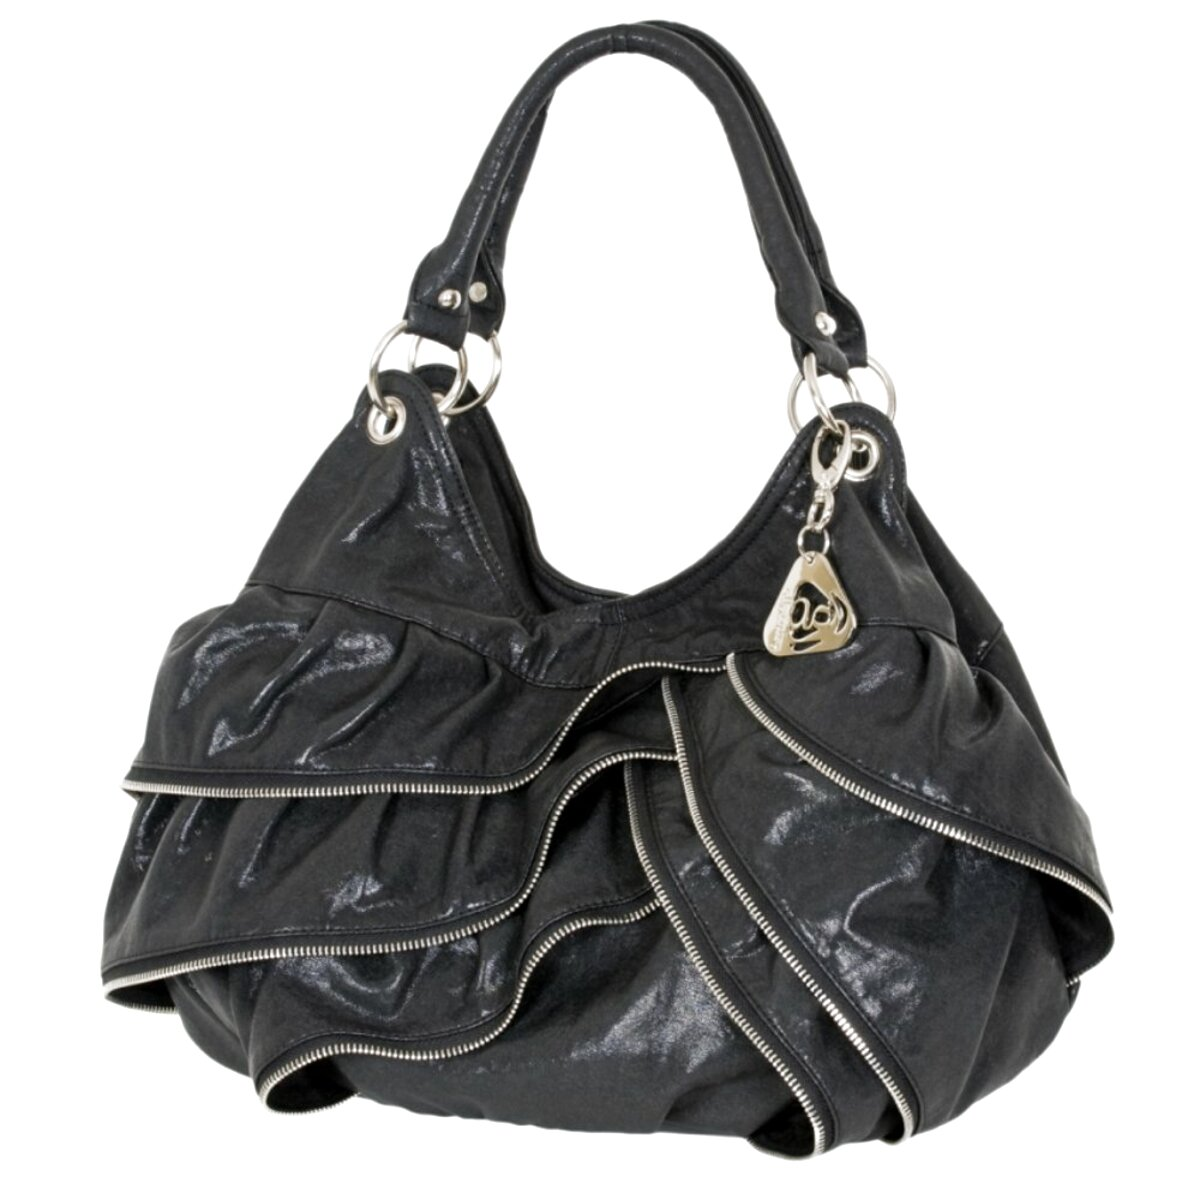 gabriella handbags for sale